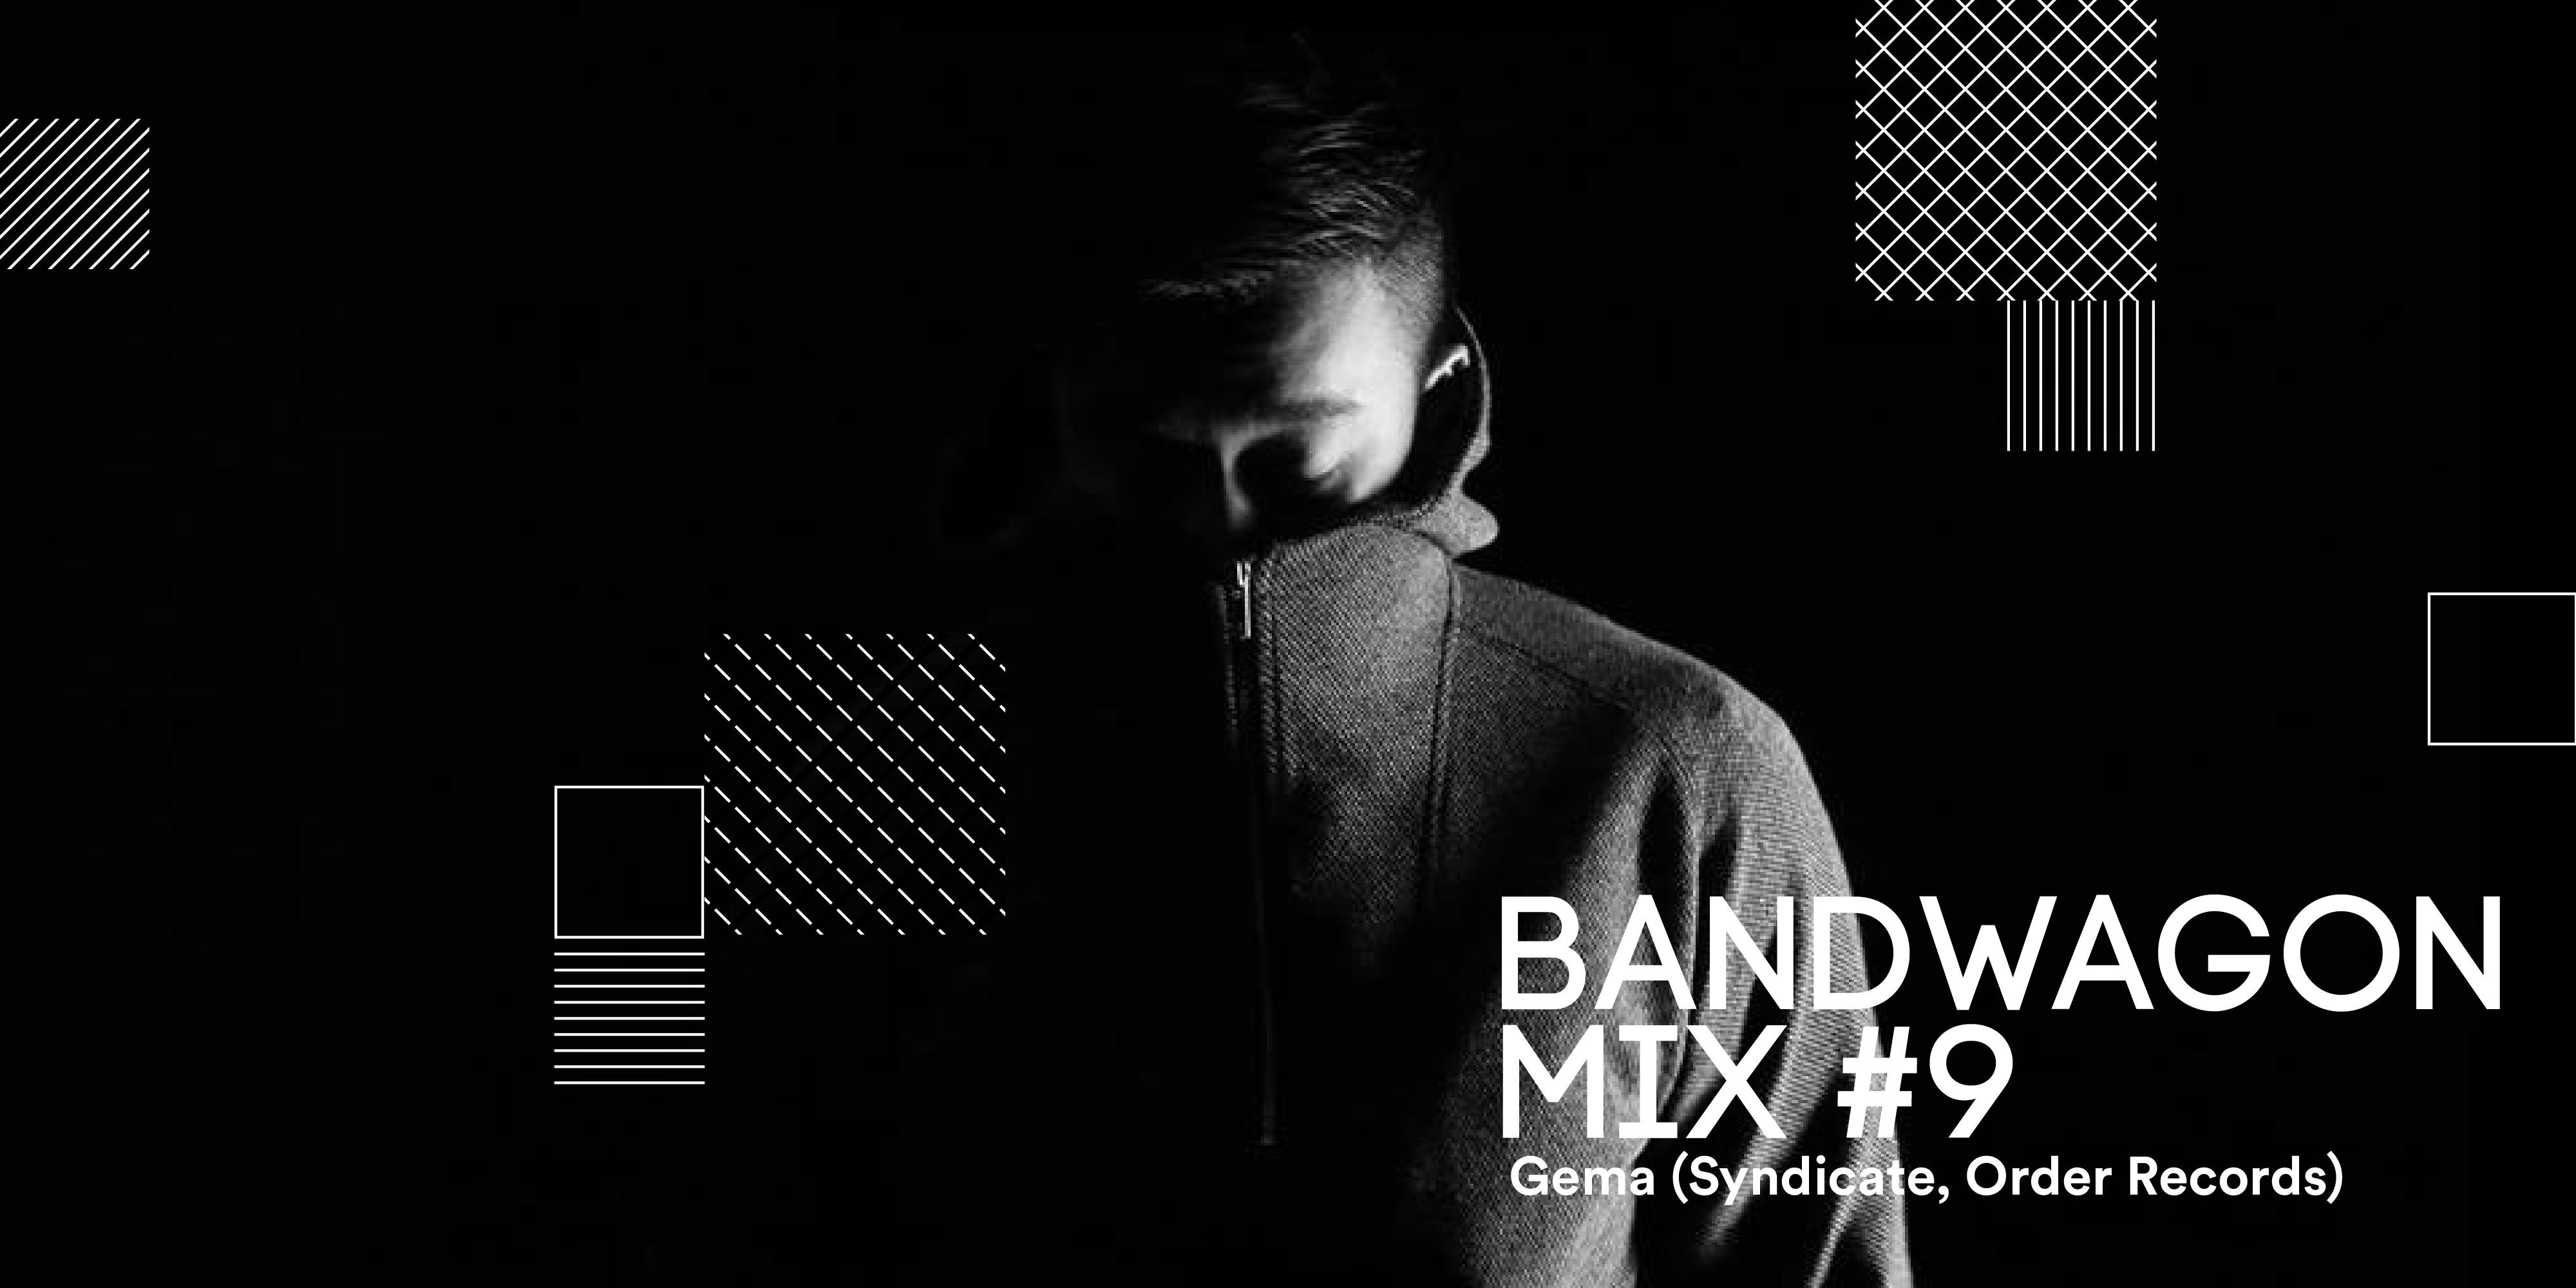 Bandwagon Mix #9: Gema (Syndicate, Order Records)